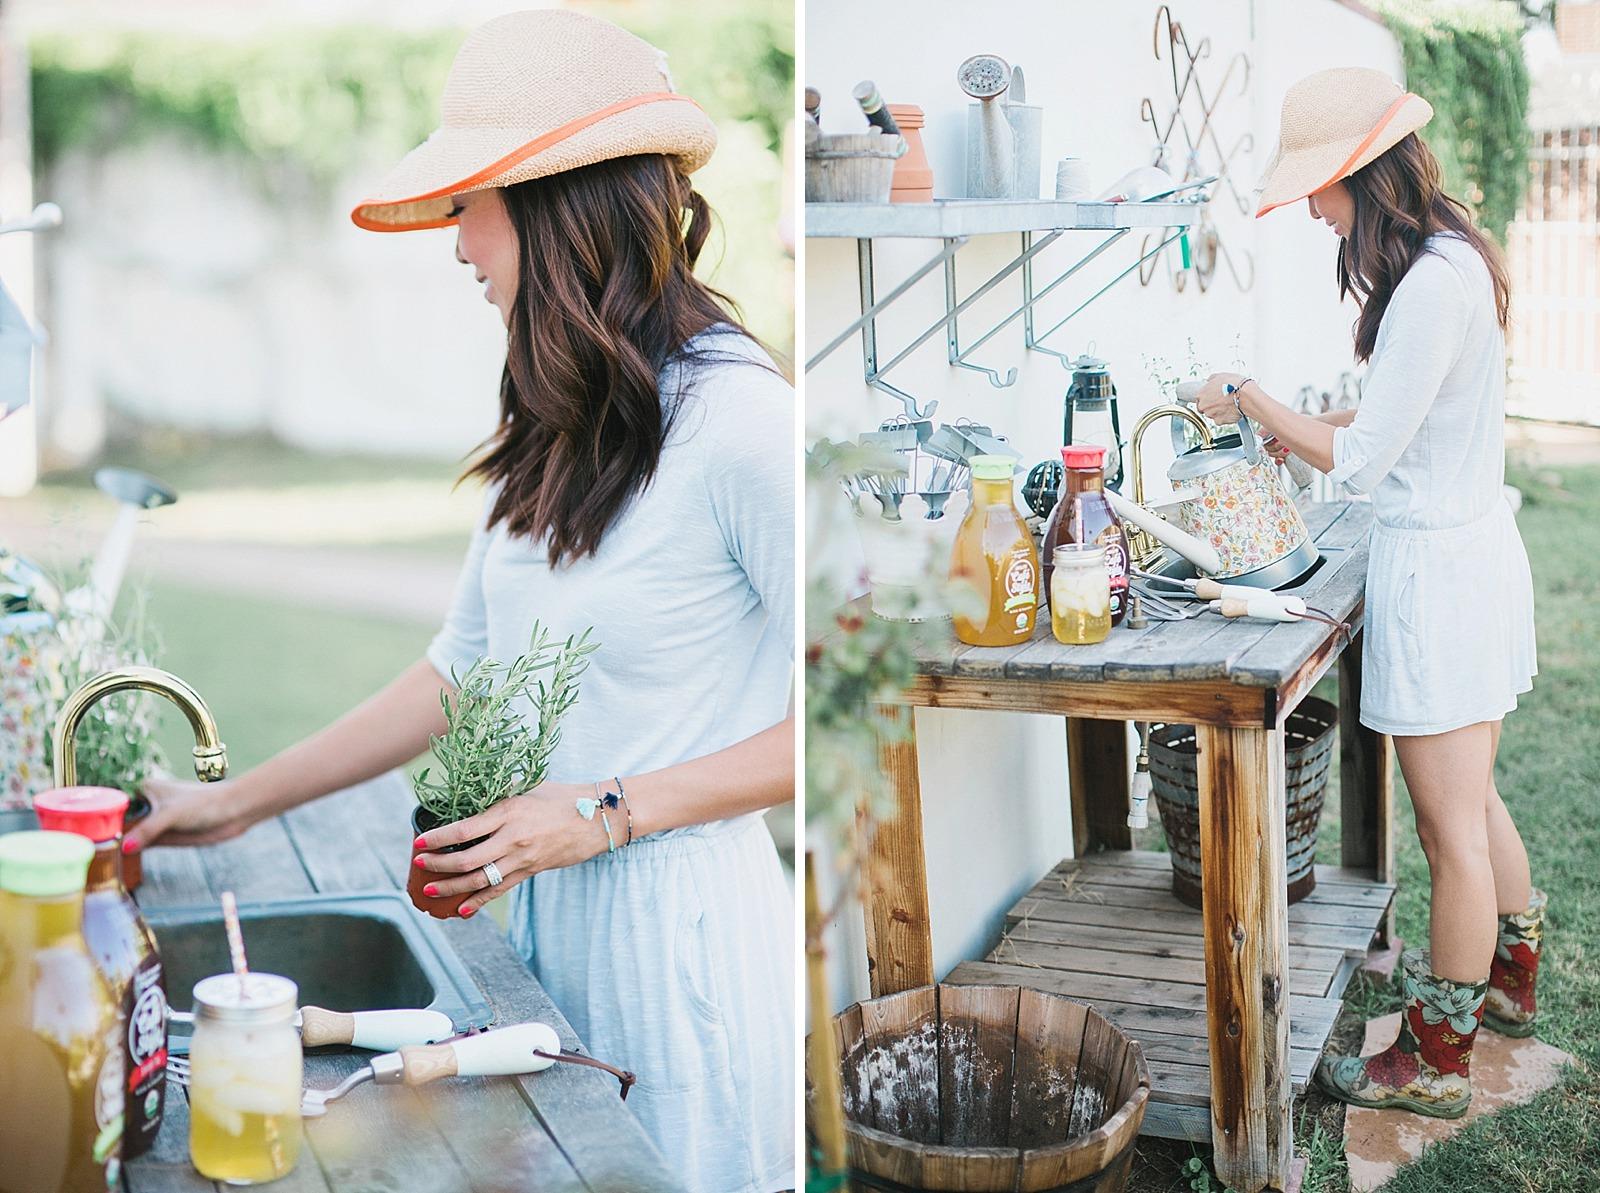 milo-iced-tea-gardening-lifestyle-blogger-diana-elizabeth-blog_0050